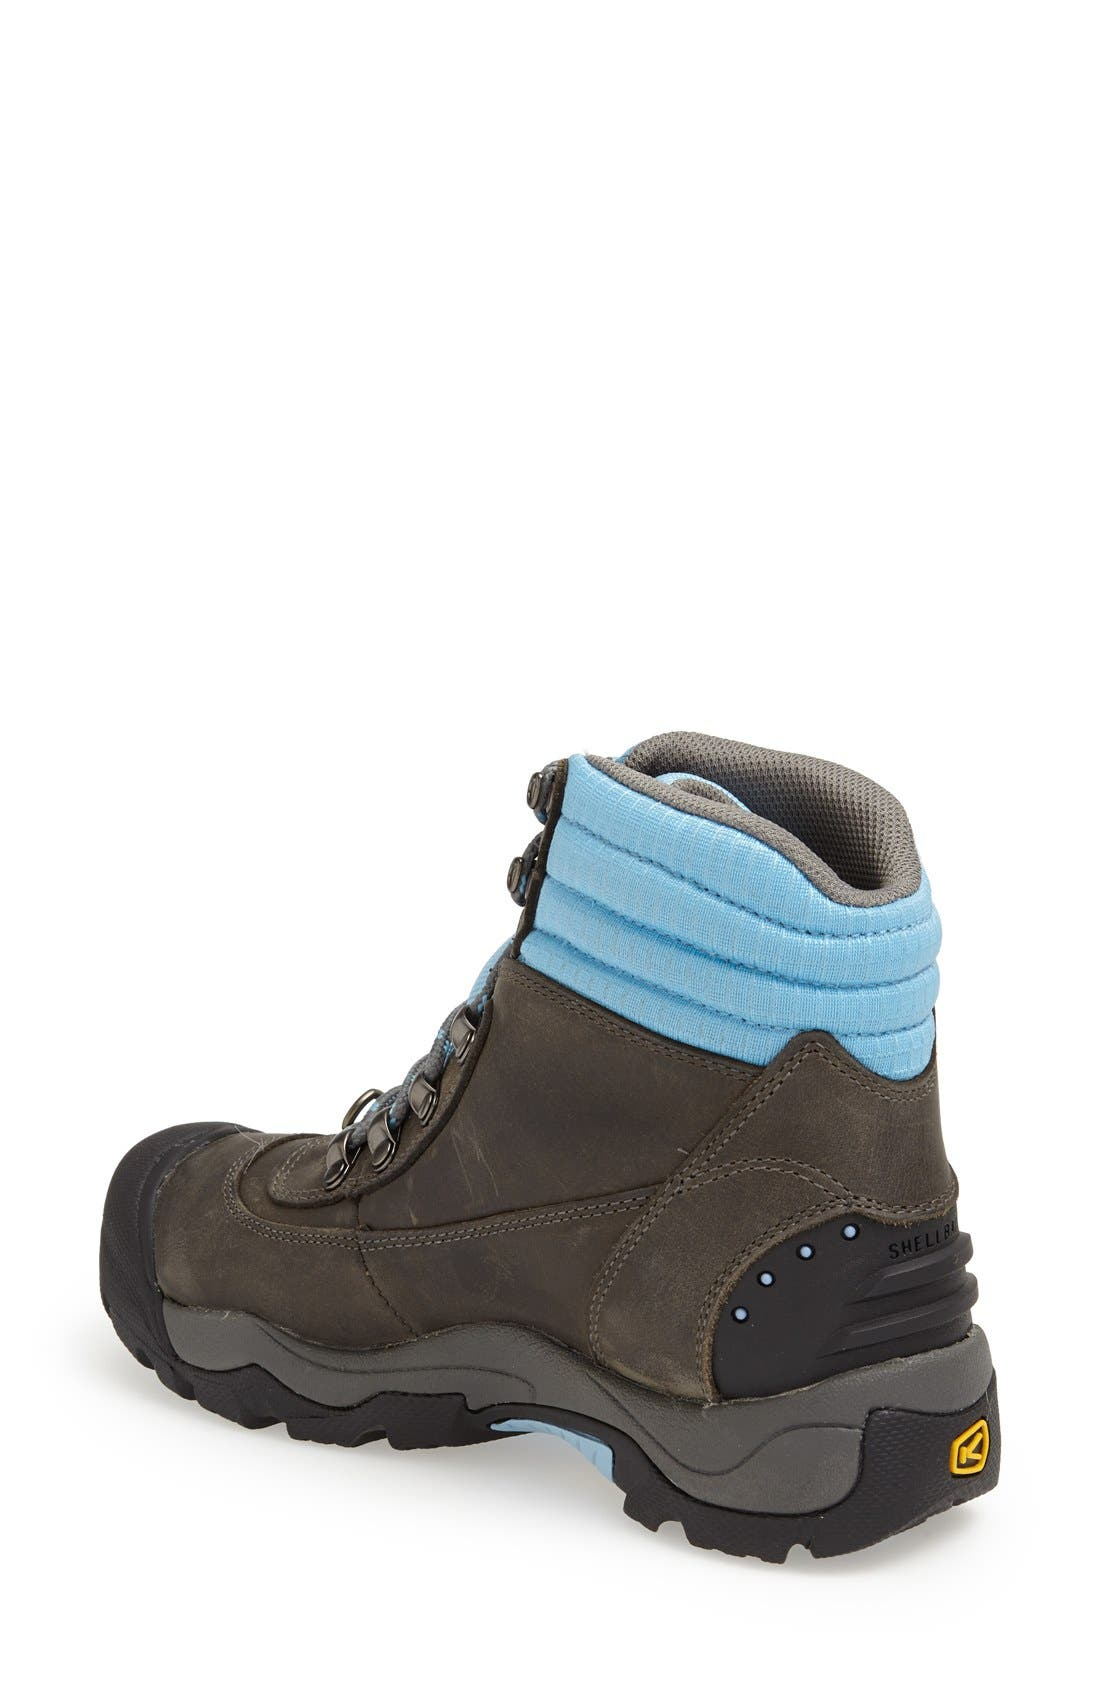 Alternate Image 2  - Keen 'Revel II' Waterproof Snow Boot (Women)